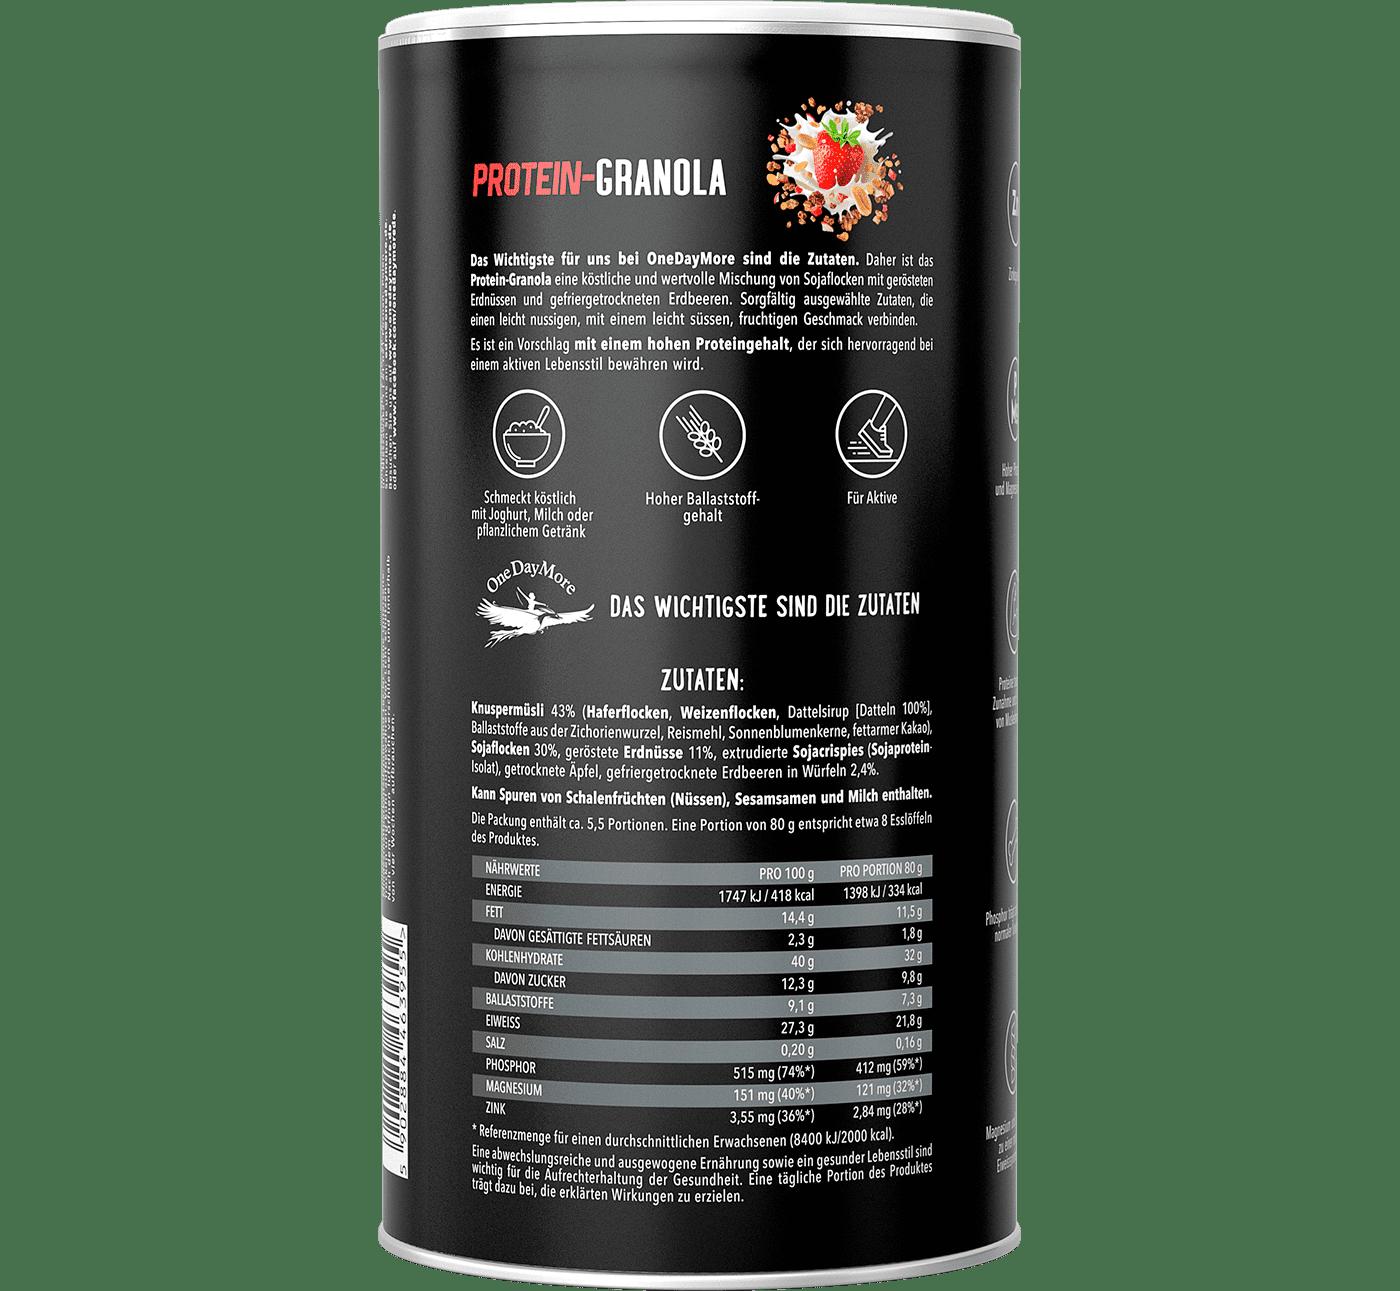 protein-granola-onedaymore-tyl-1400×1291